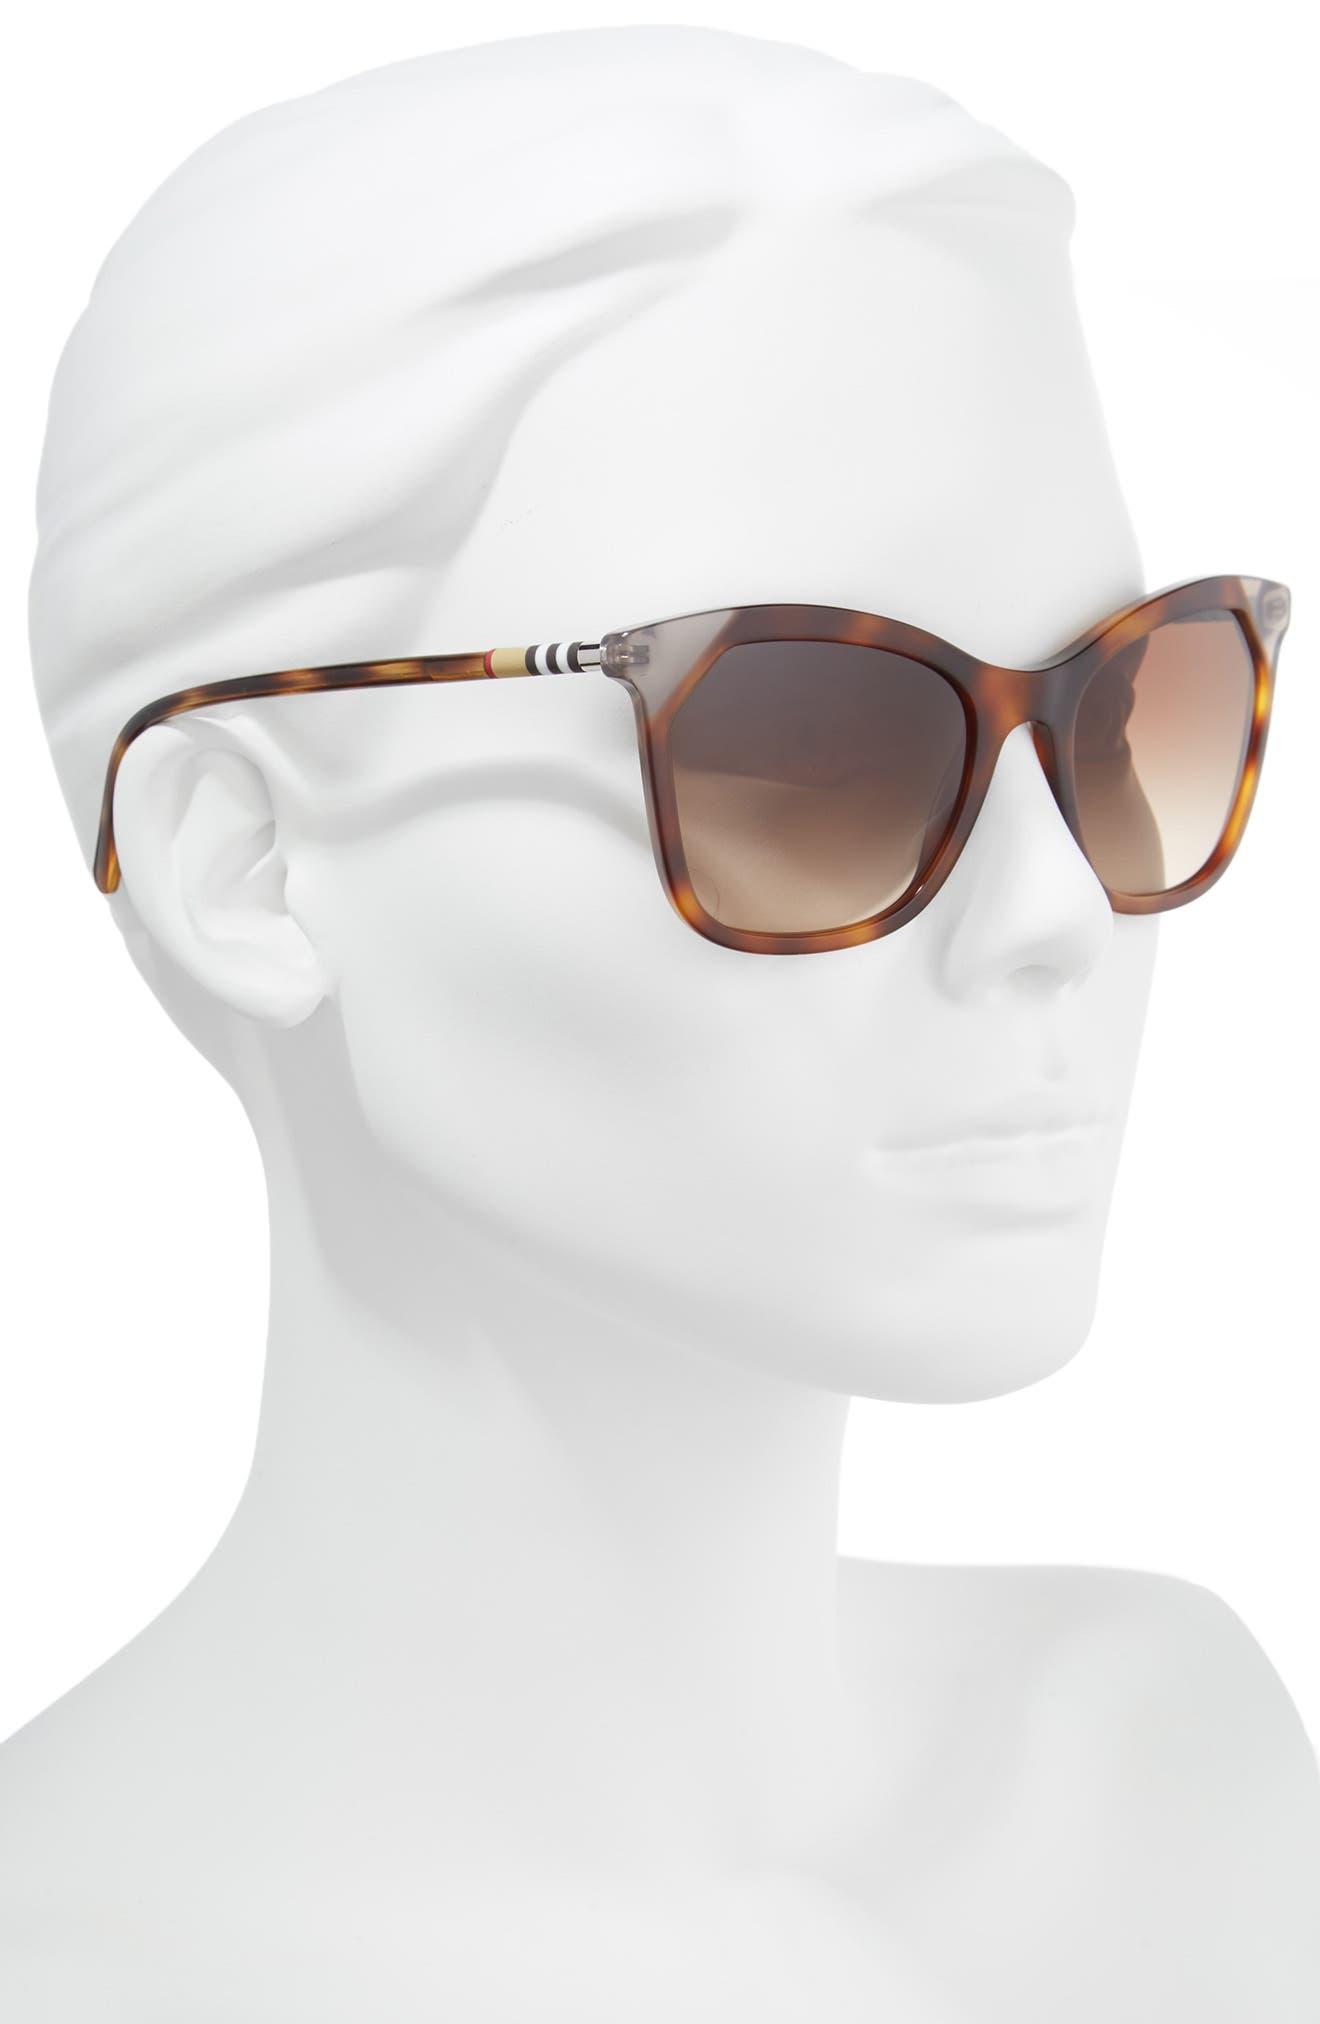 Heritage 54mm Square Sunglasses,                             Alternate thumbnail 6, color,